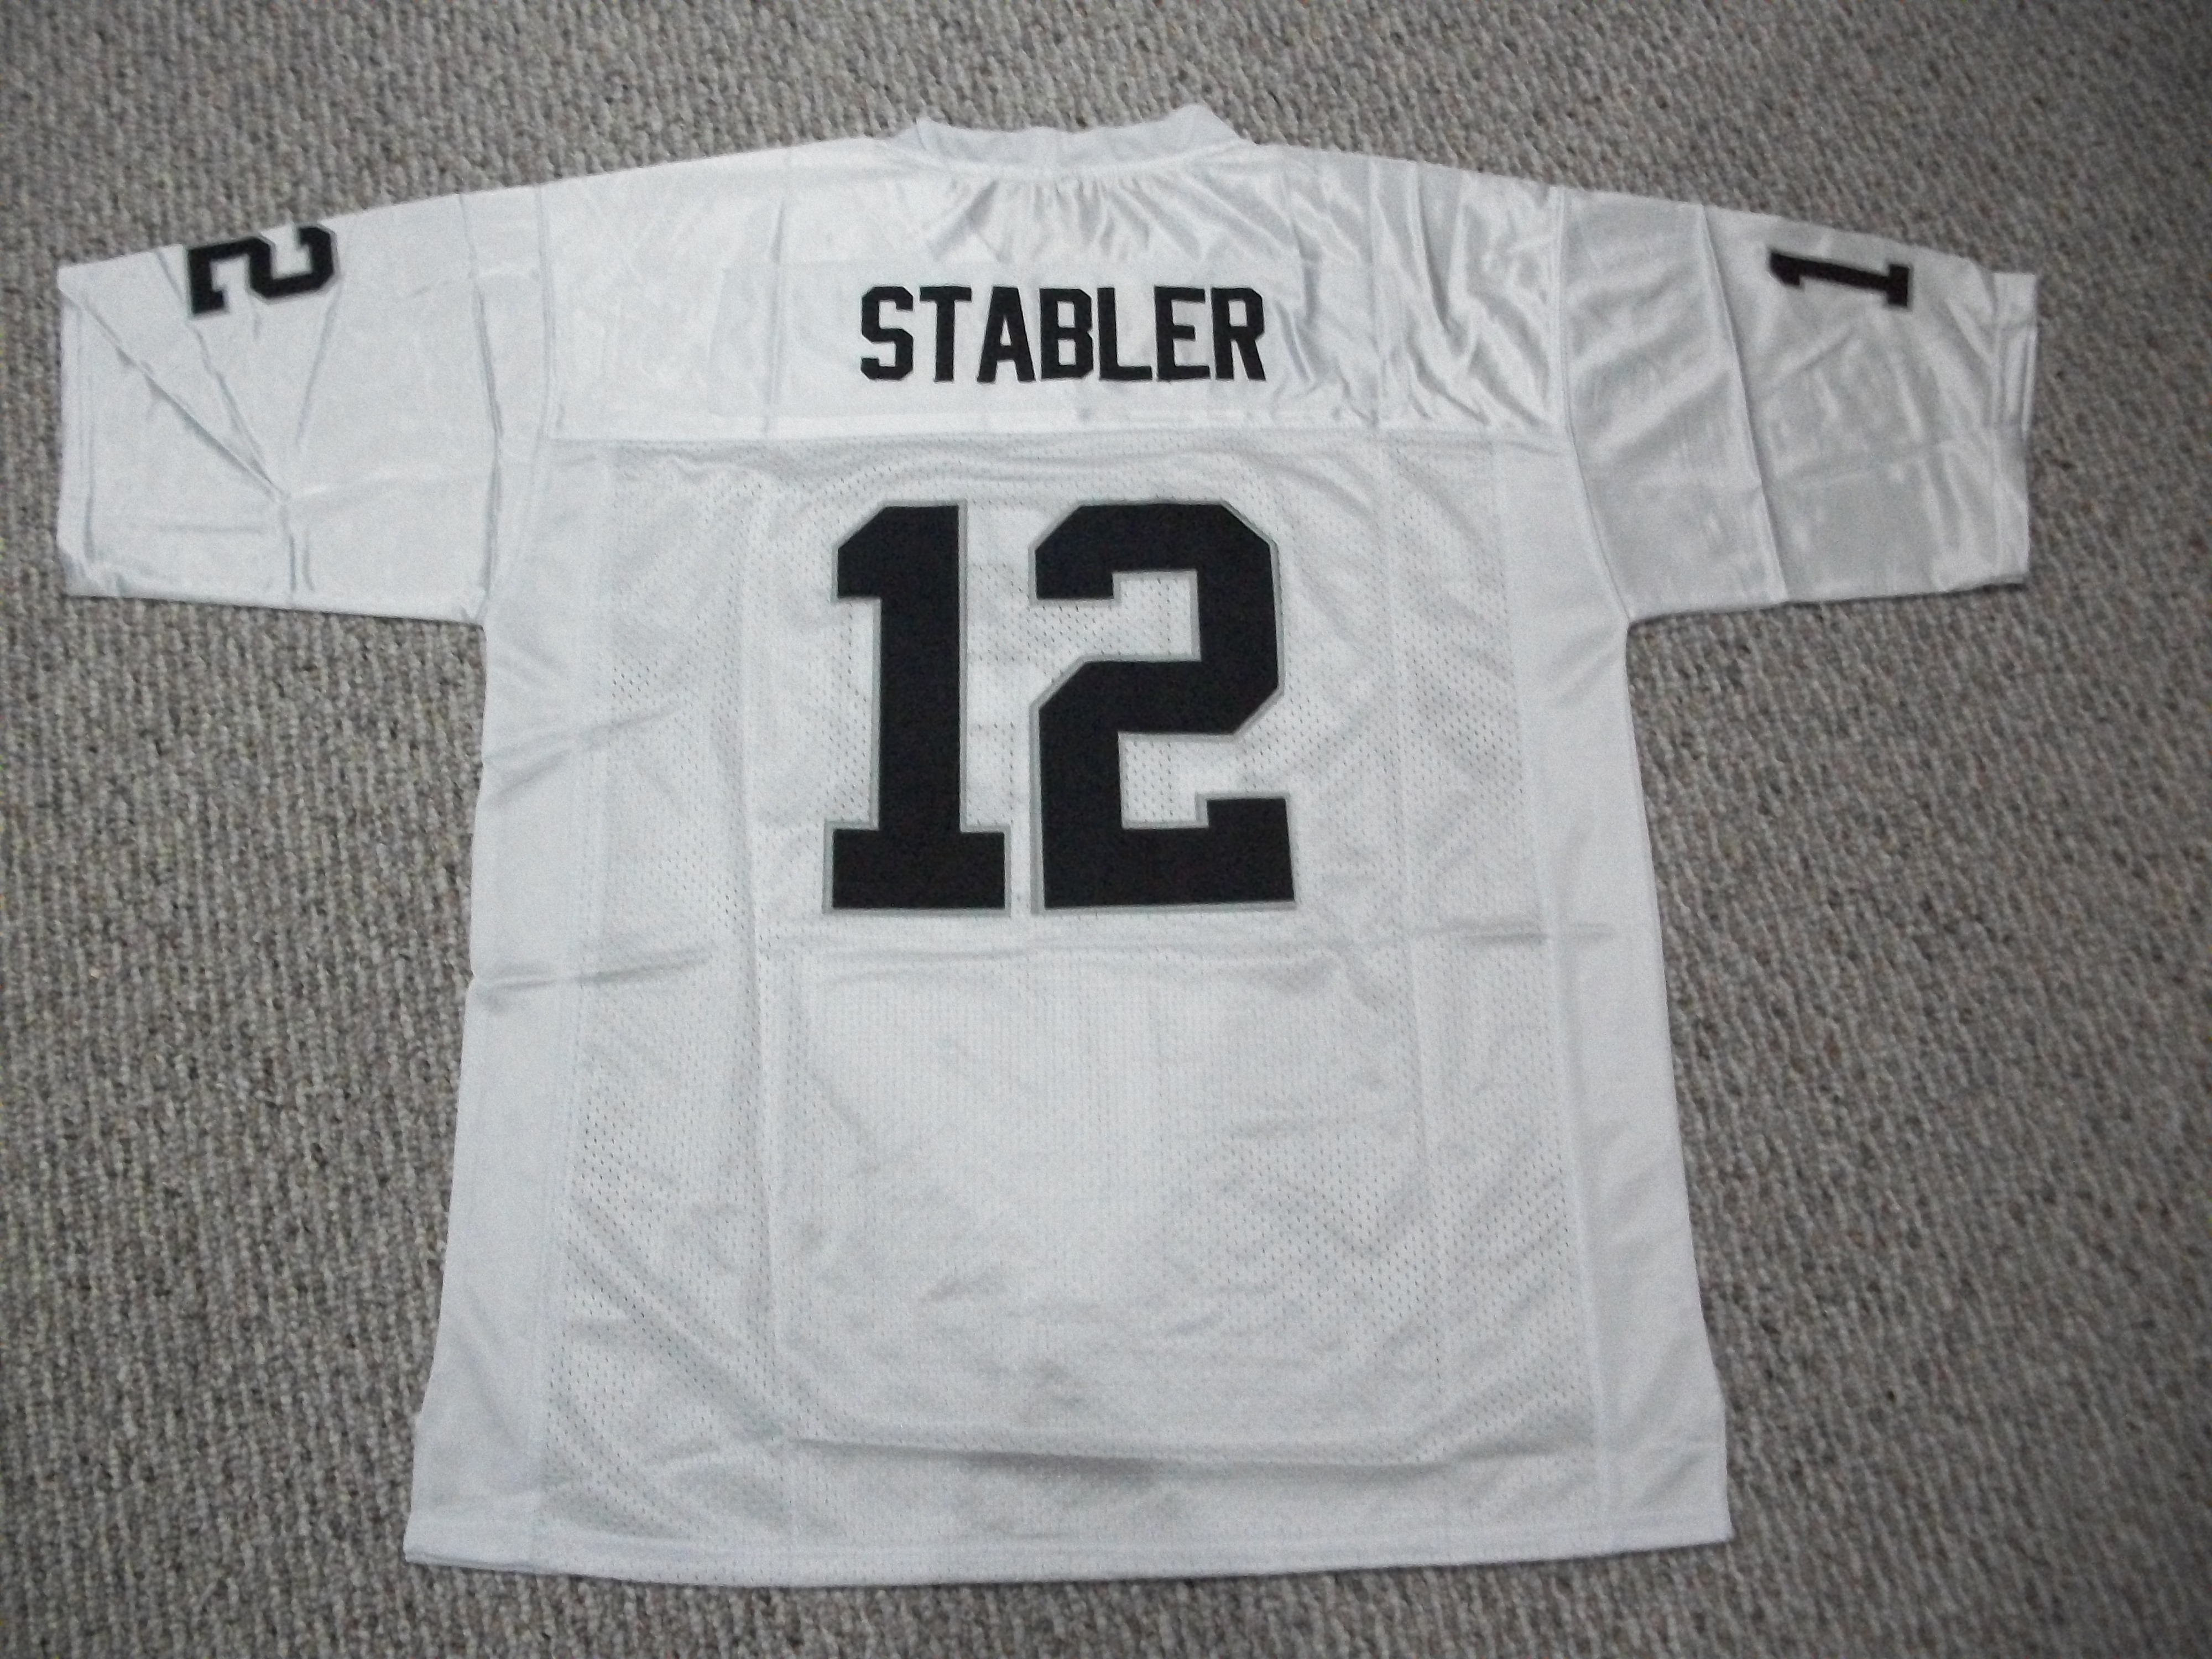 Unsigned Ken Stabler Jersey #12 Oakland/LA Custom Stitched White Football New No Brands/Logos Sizes S-3XL - Walmart.com